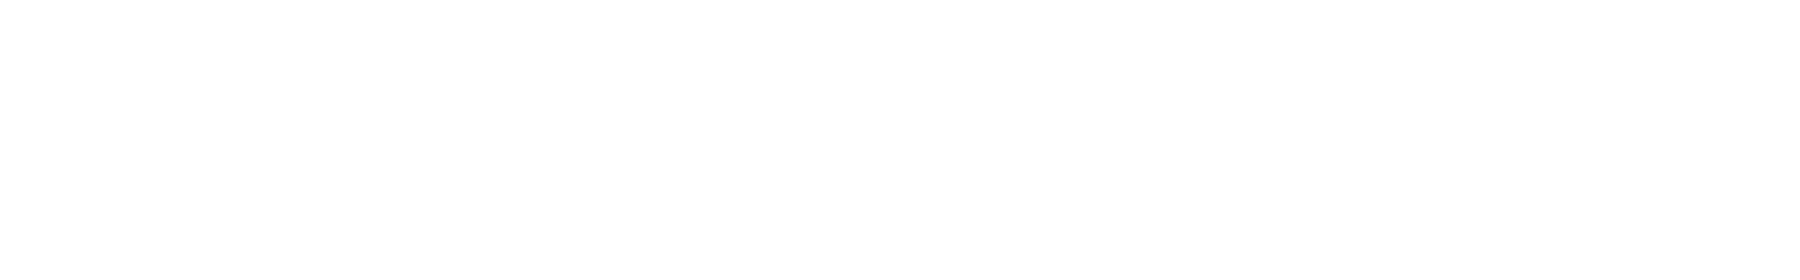 g abs05 081